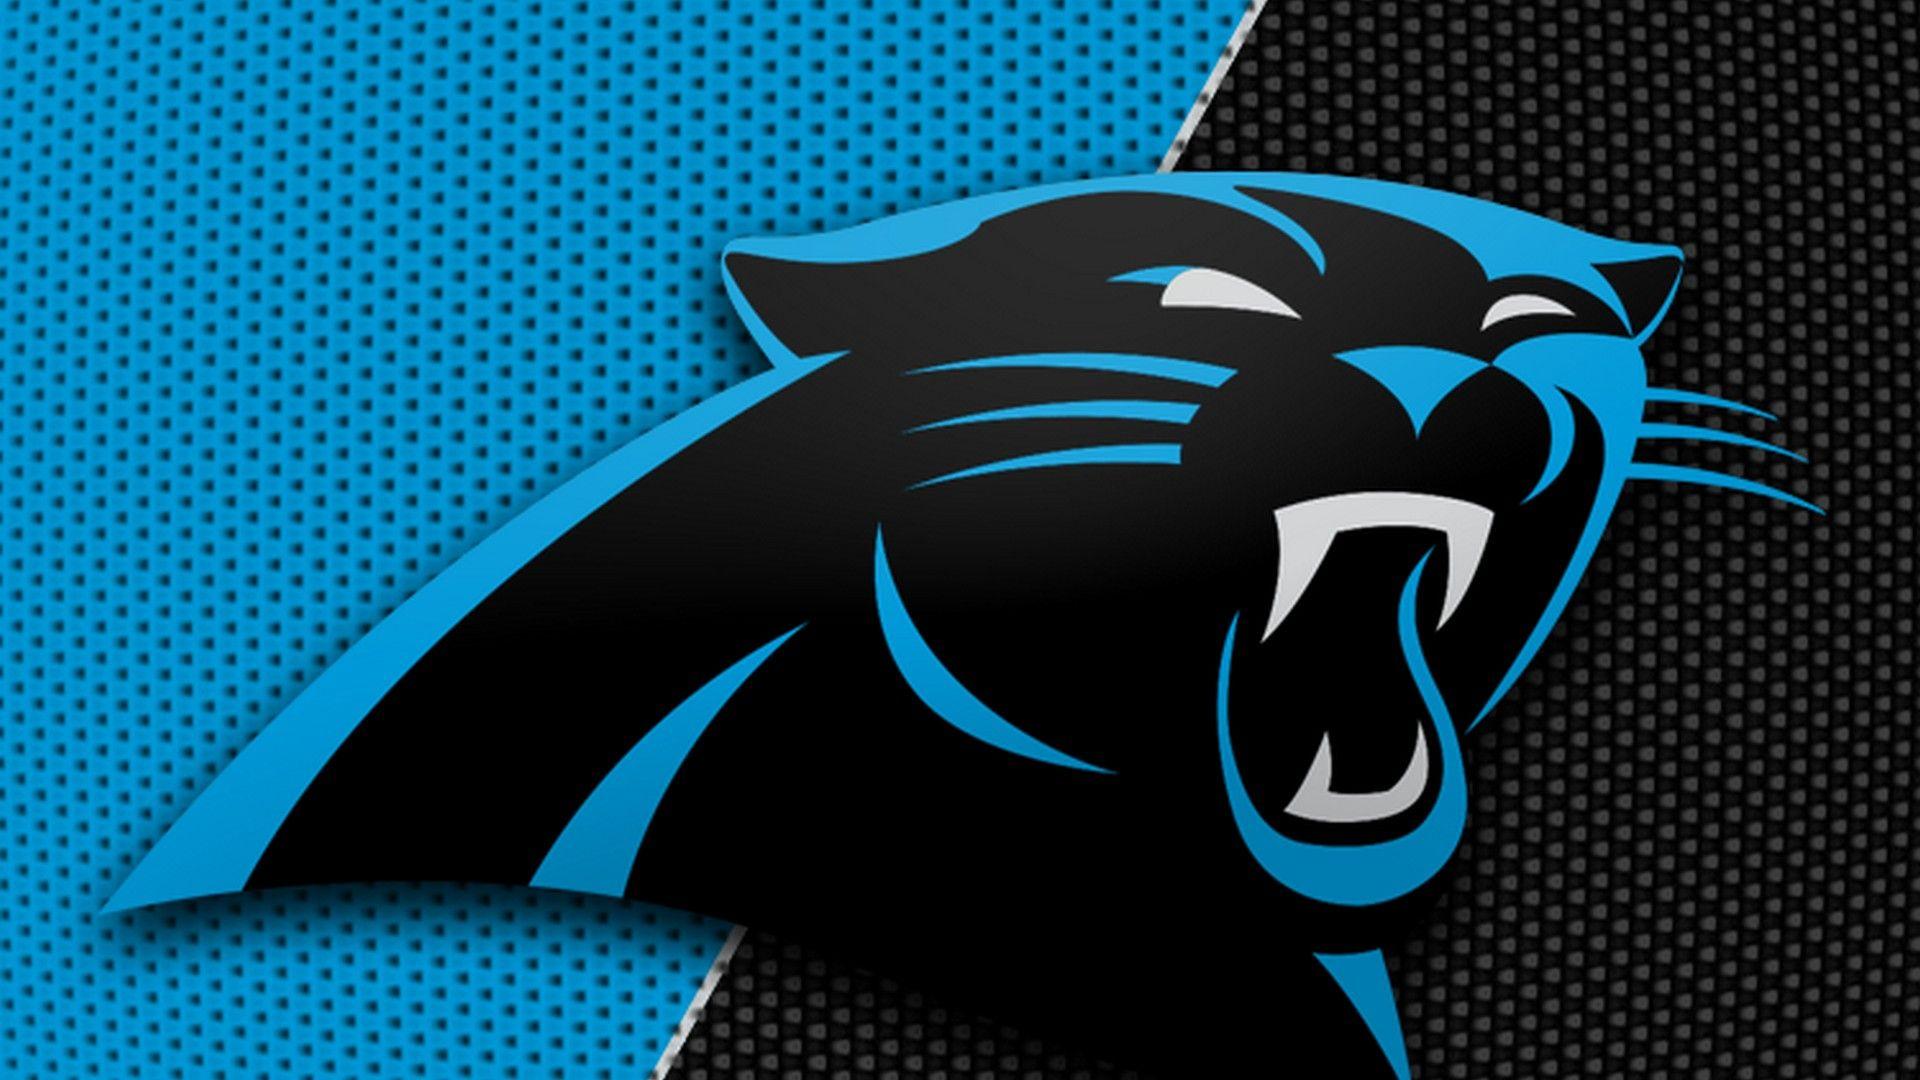 Reasons Why You Should Get Carolina Panthers wallpaper